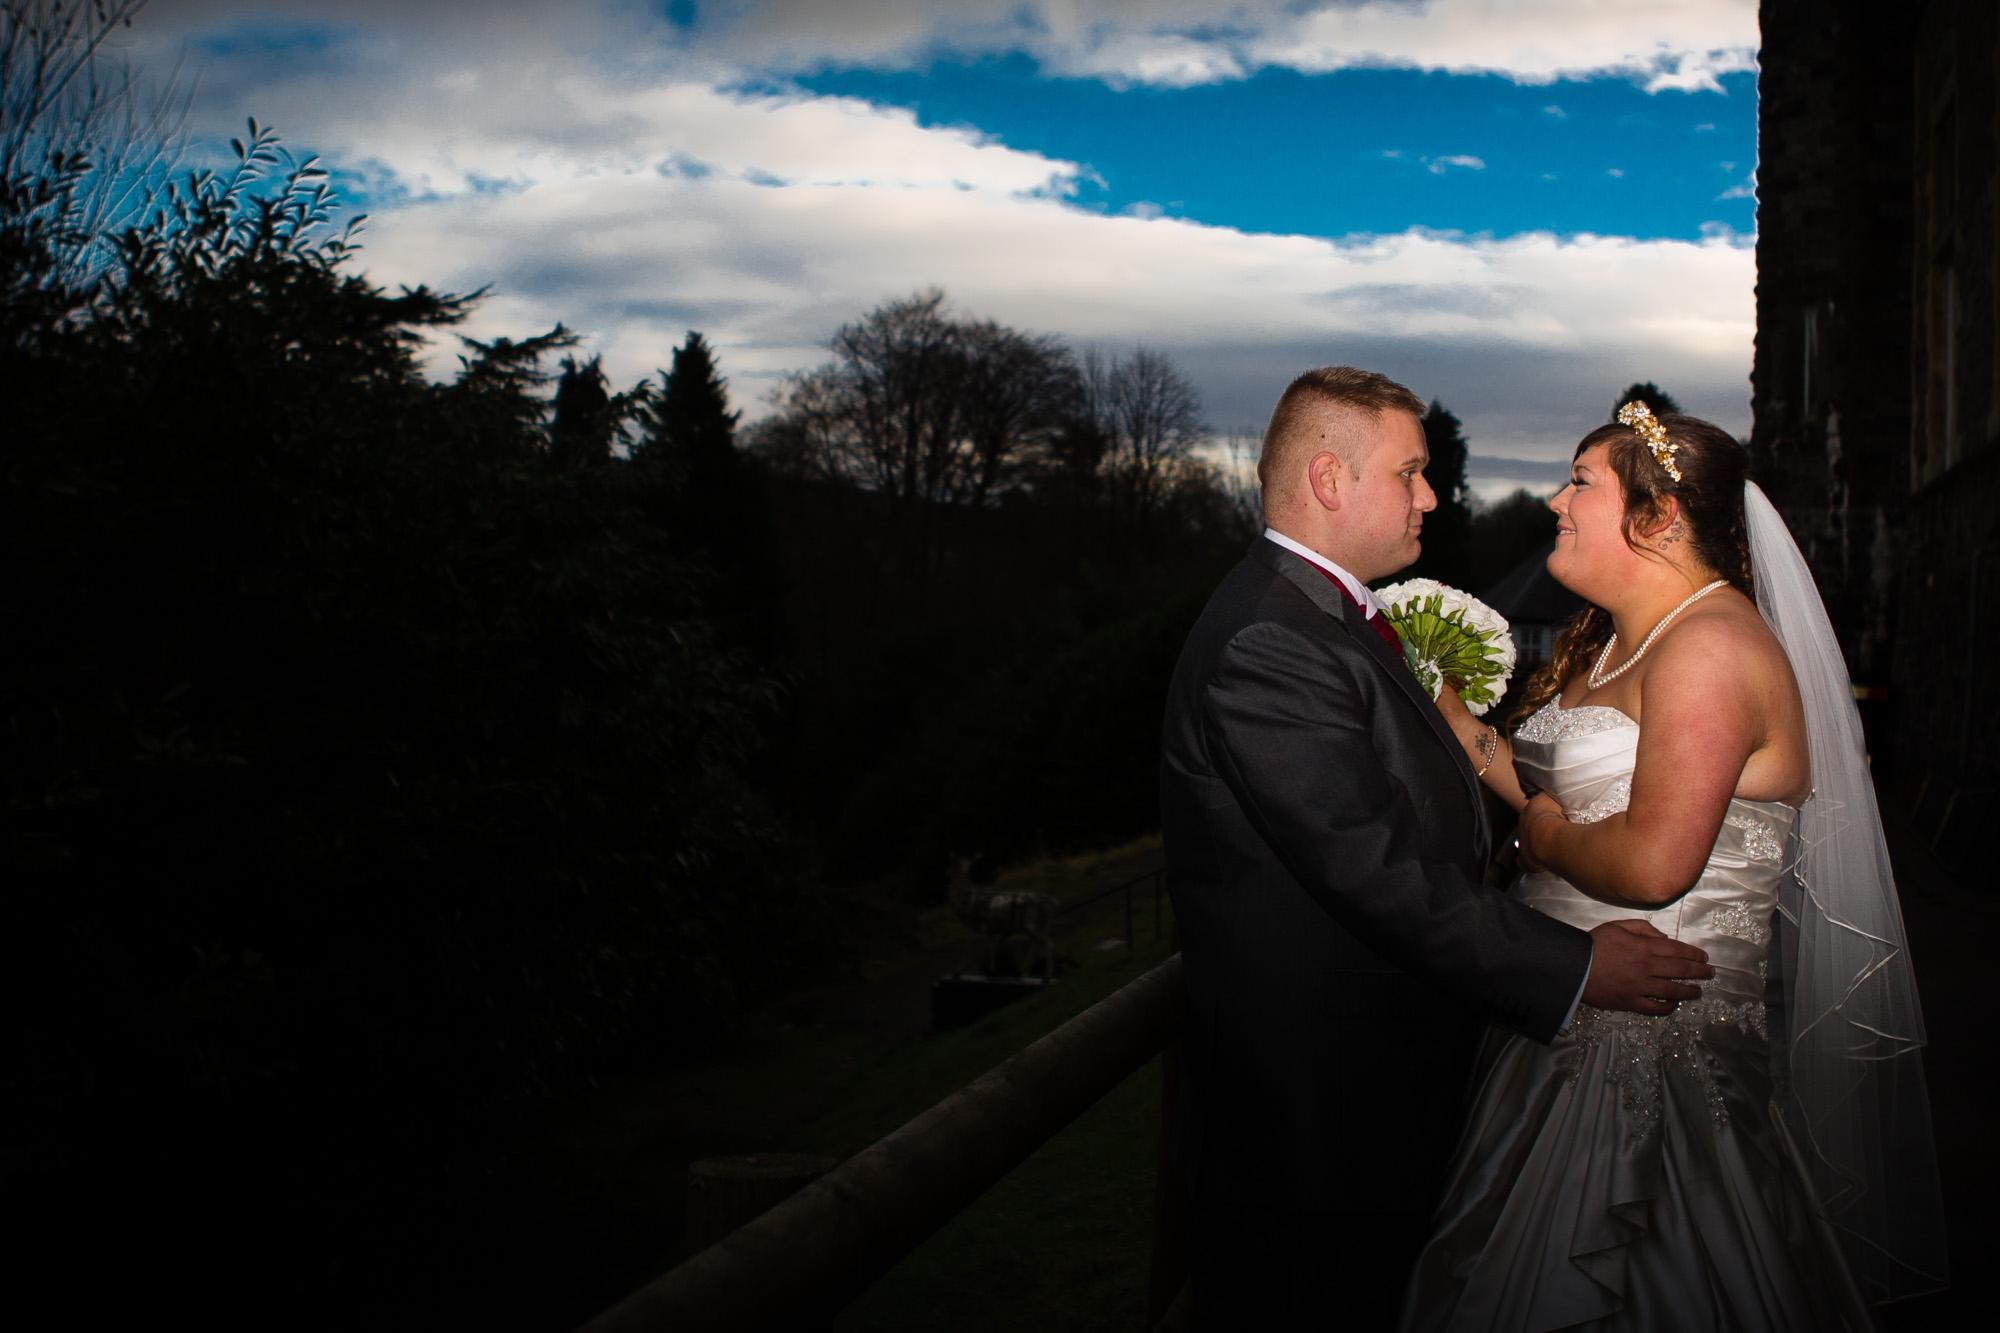 South Wales Wedding Photograher at Craig Y Nos Castle (24)